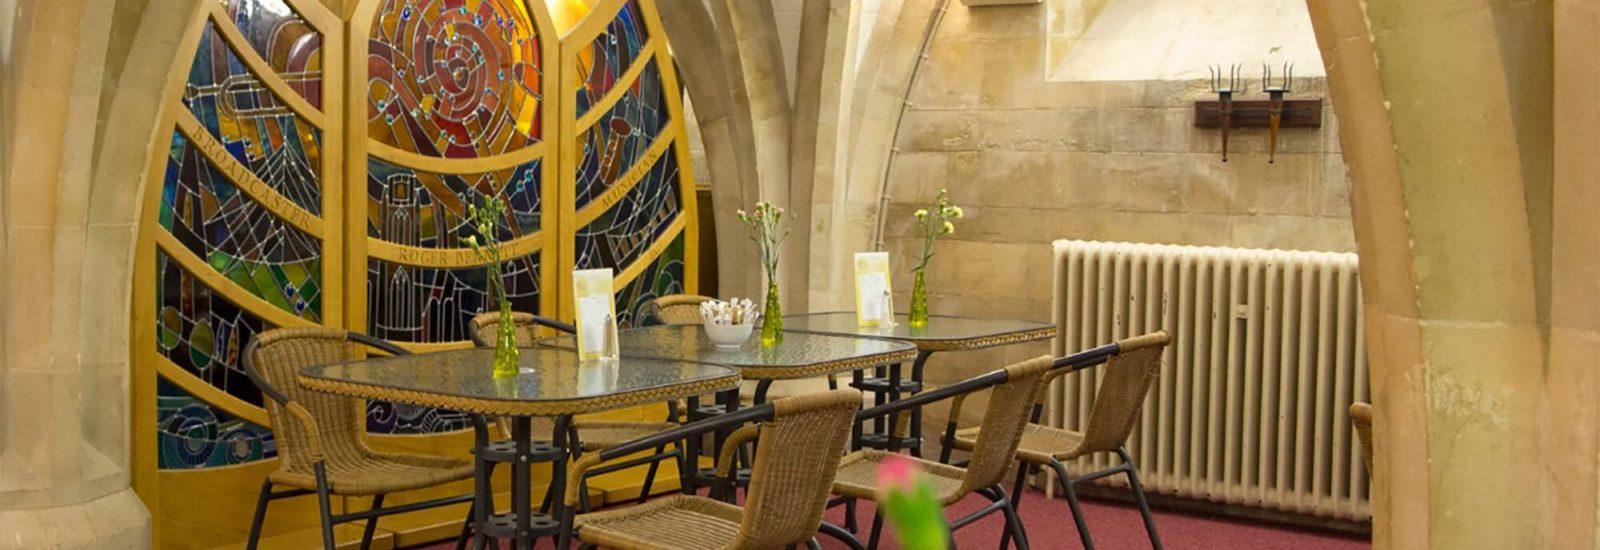 Image of Arc Cafe